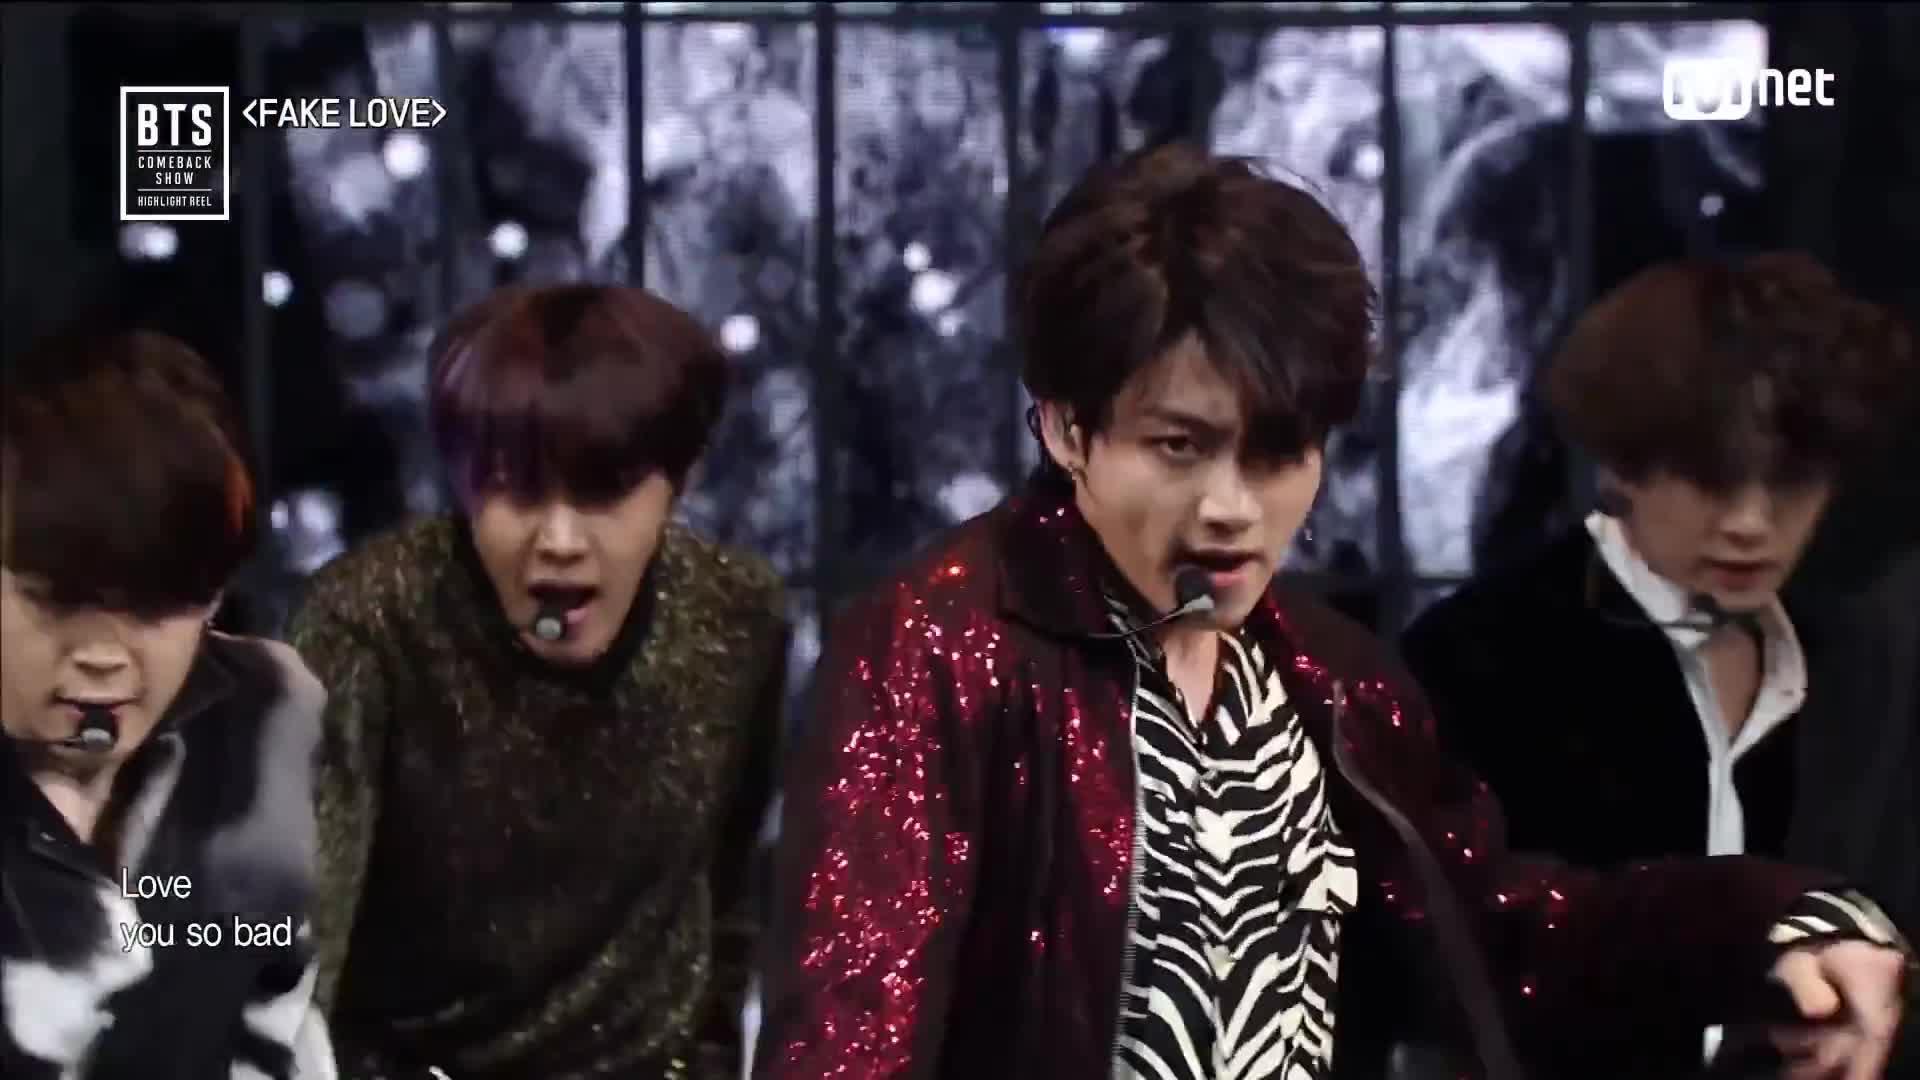 Bts 방탄소년단 Fake Love At Bts Comeback Show Gif